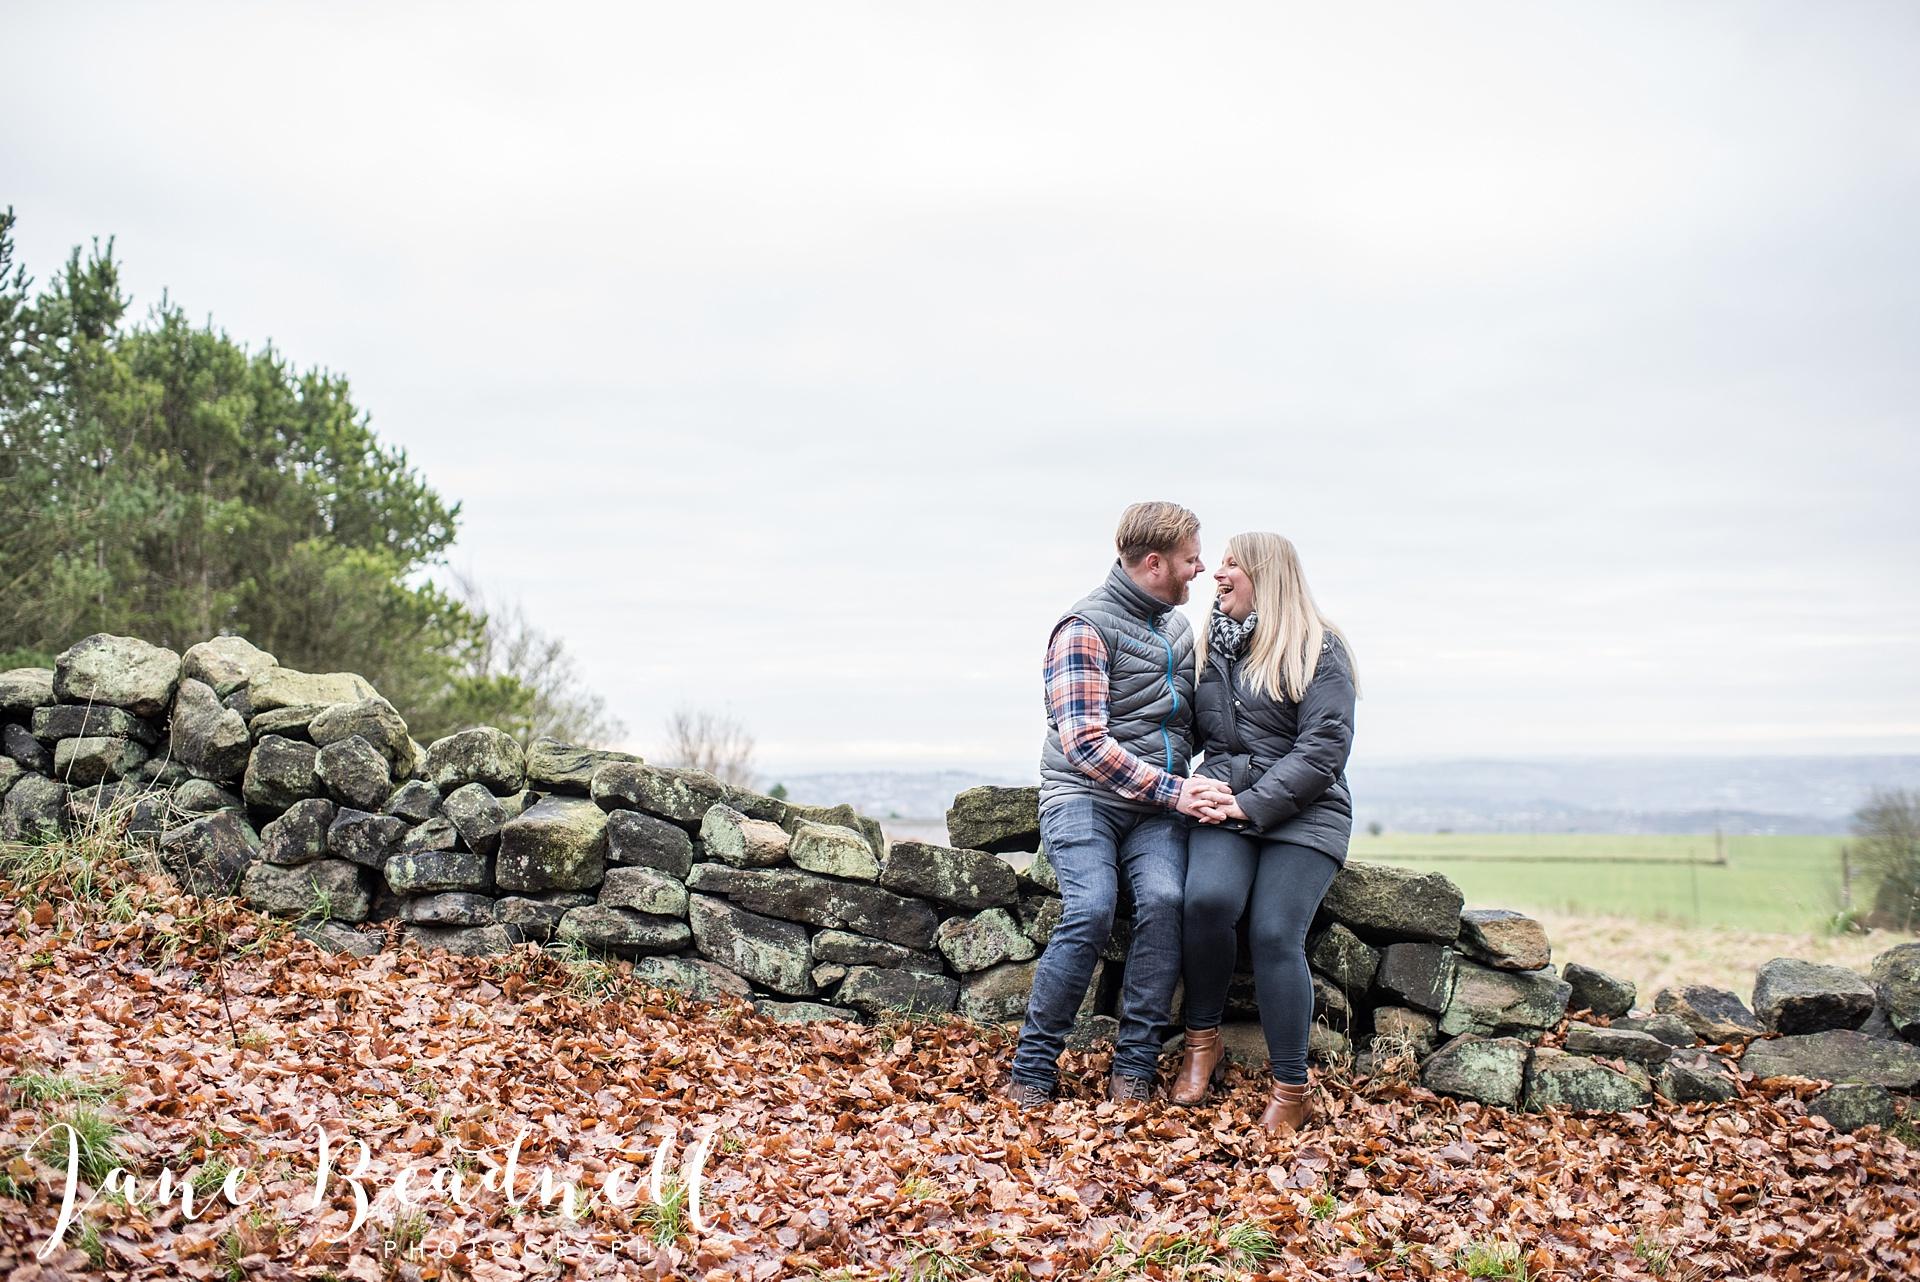 yorkshire-wedding-photographer-jane-beadnell-photography-uk-and-destination-wedding-photographer-engagement-shoot_0025